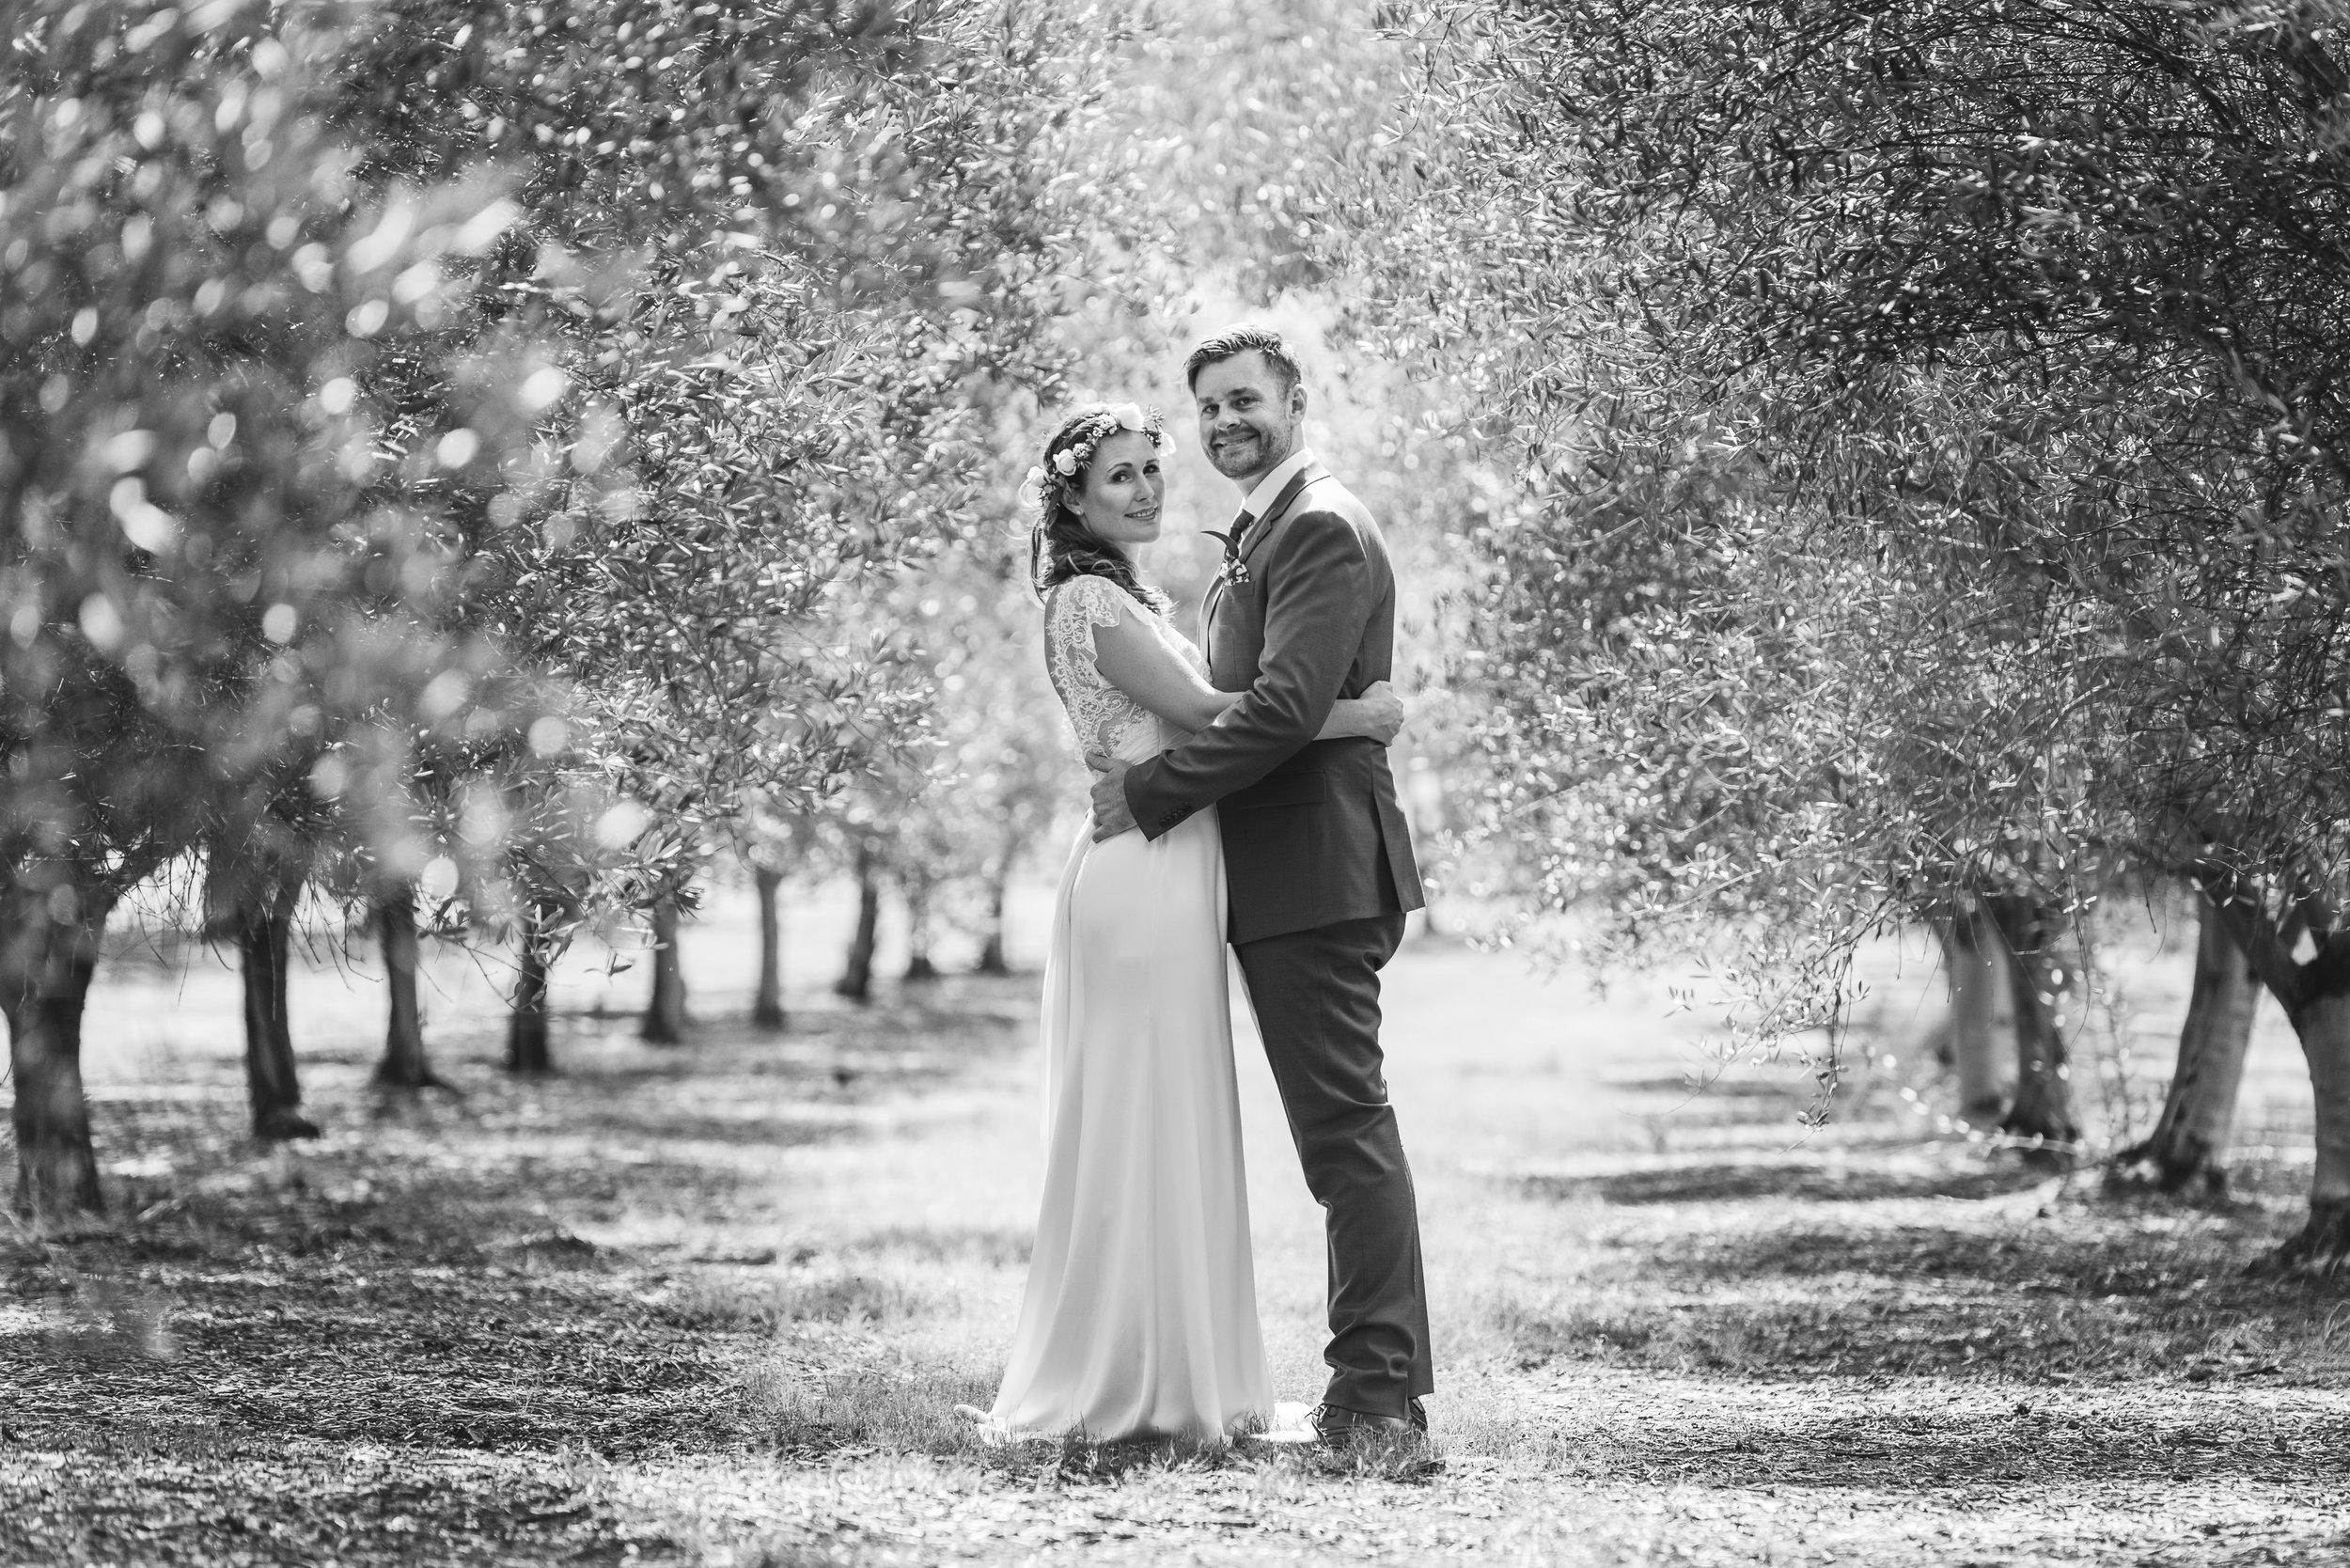 weddings by atelier photography-wedding-04.jpg